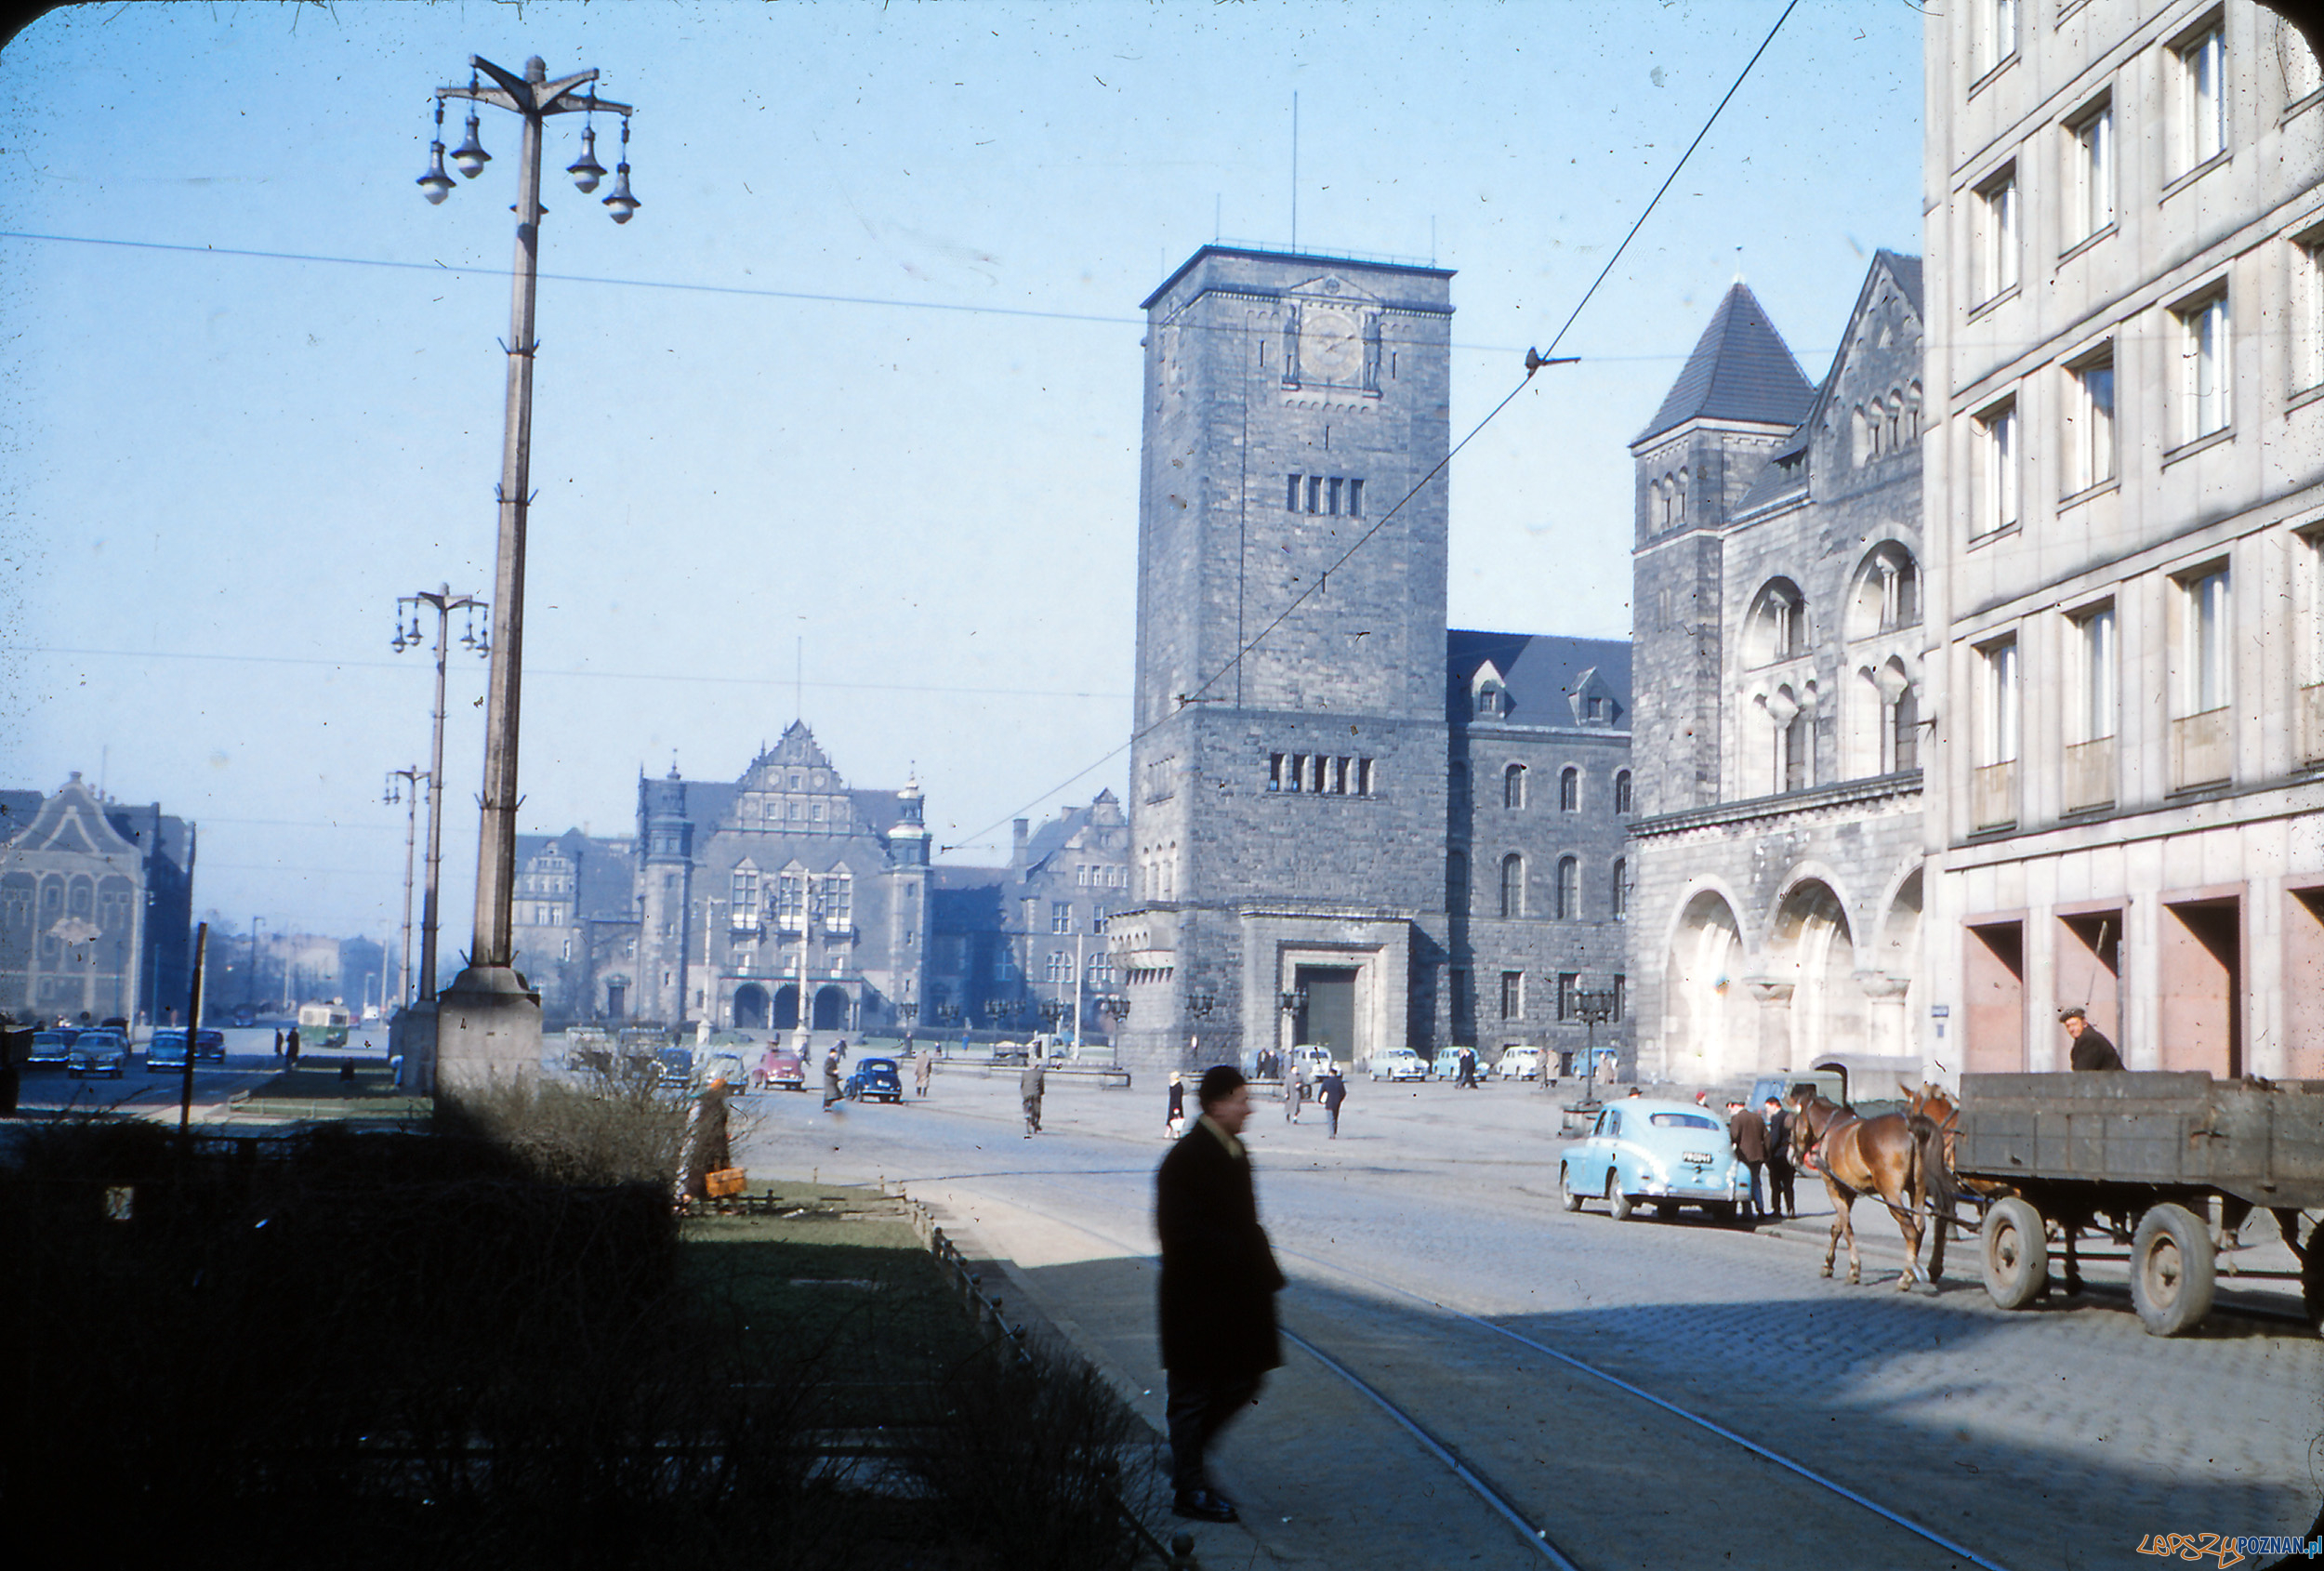 Święty Marcin - koniec lat 50-tych  Foto: Mogens Tørsleff, kolekcja Gorma Rudschinata / Flickr / CC